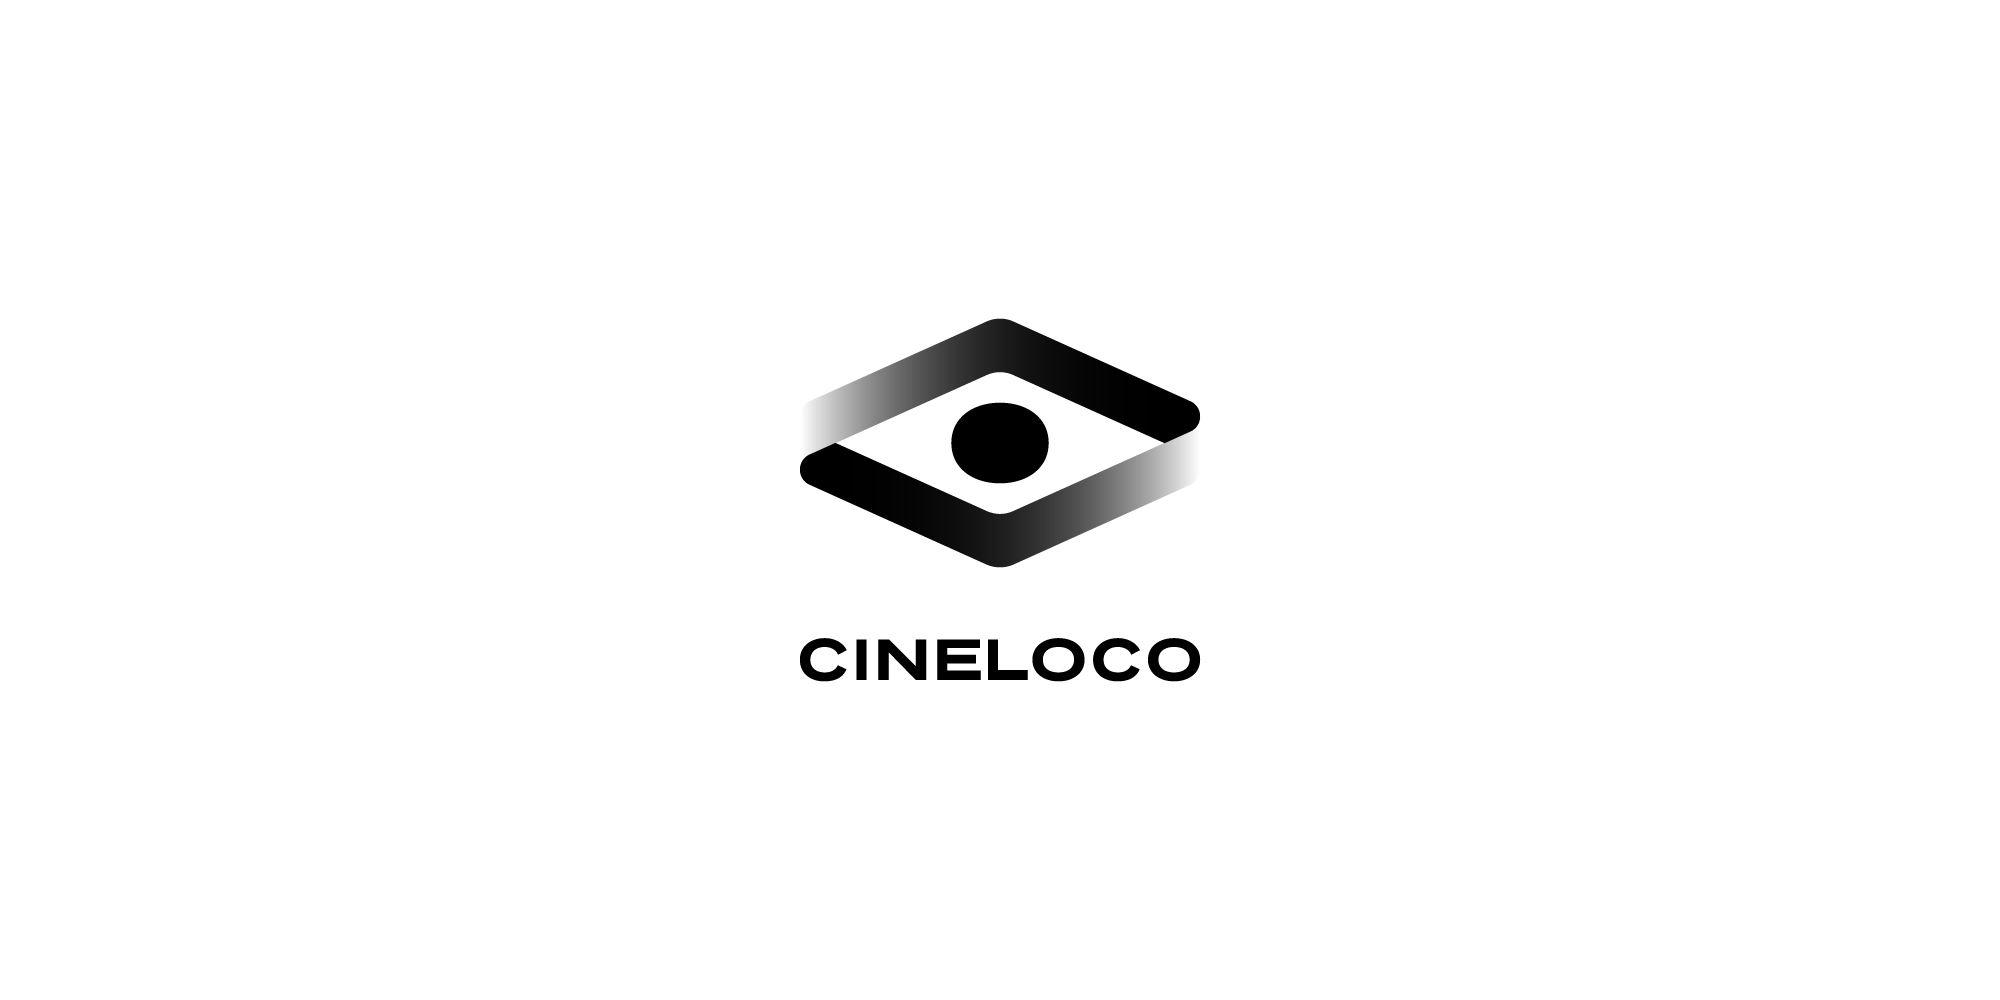 Cineloco_8.jpg